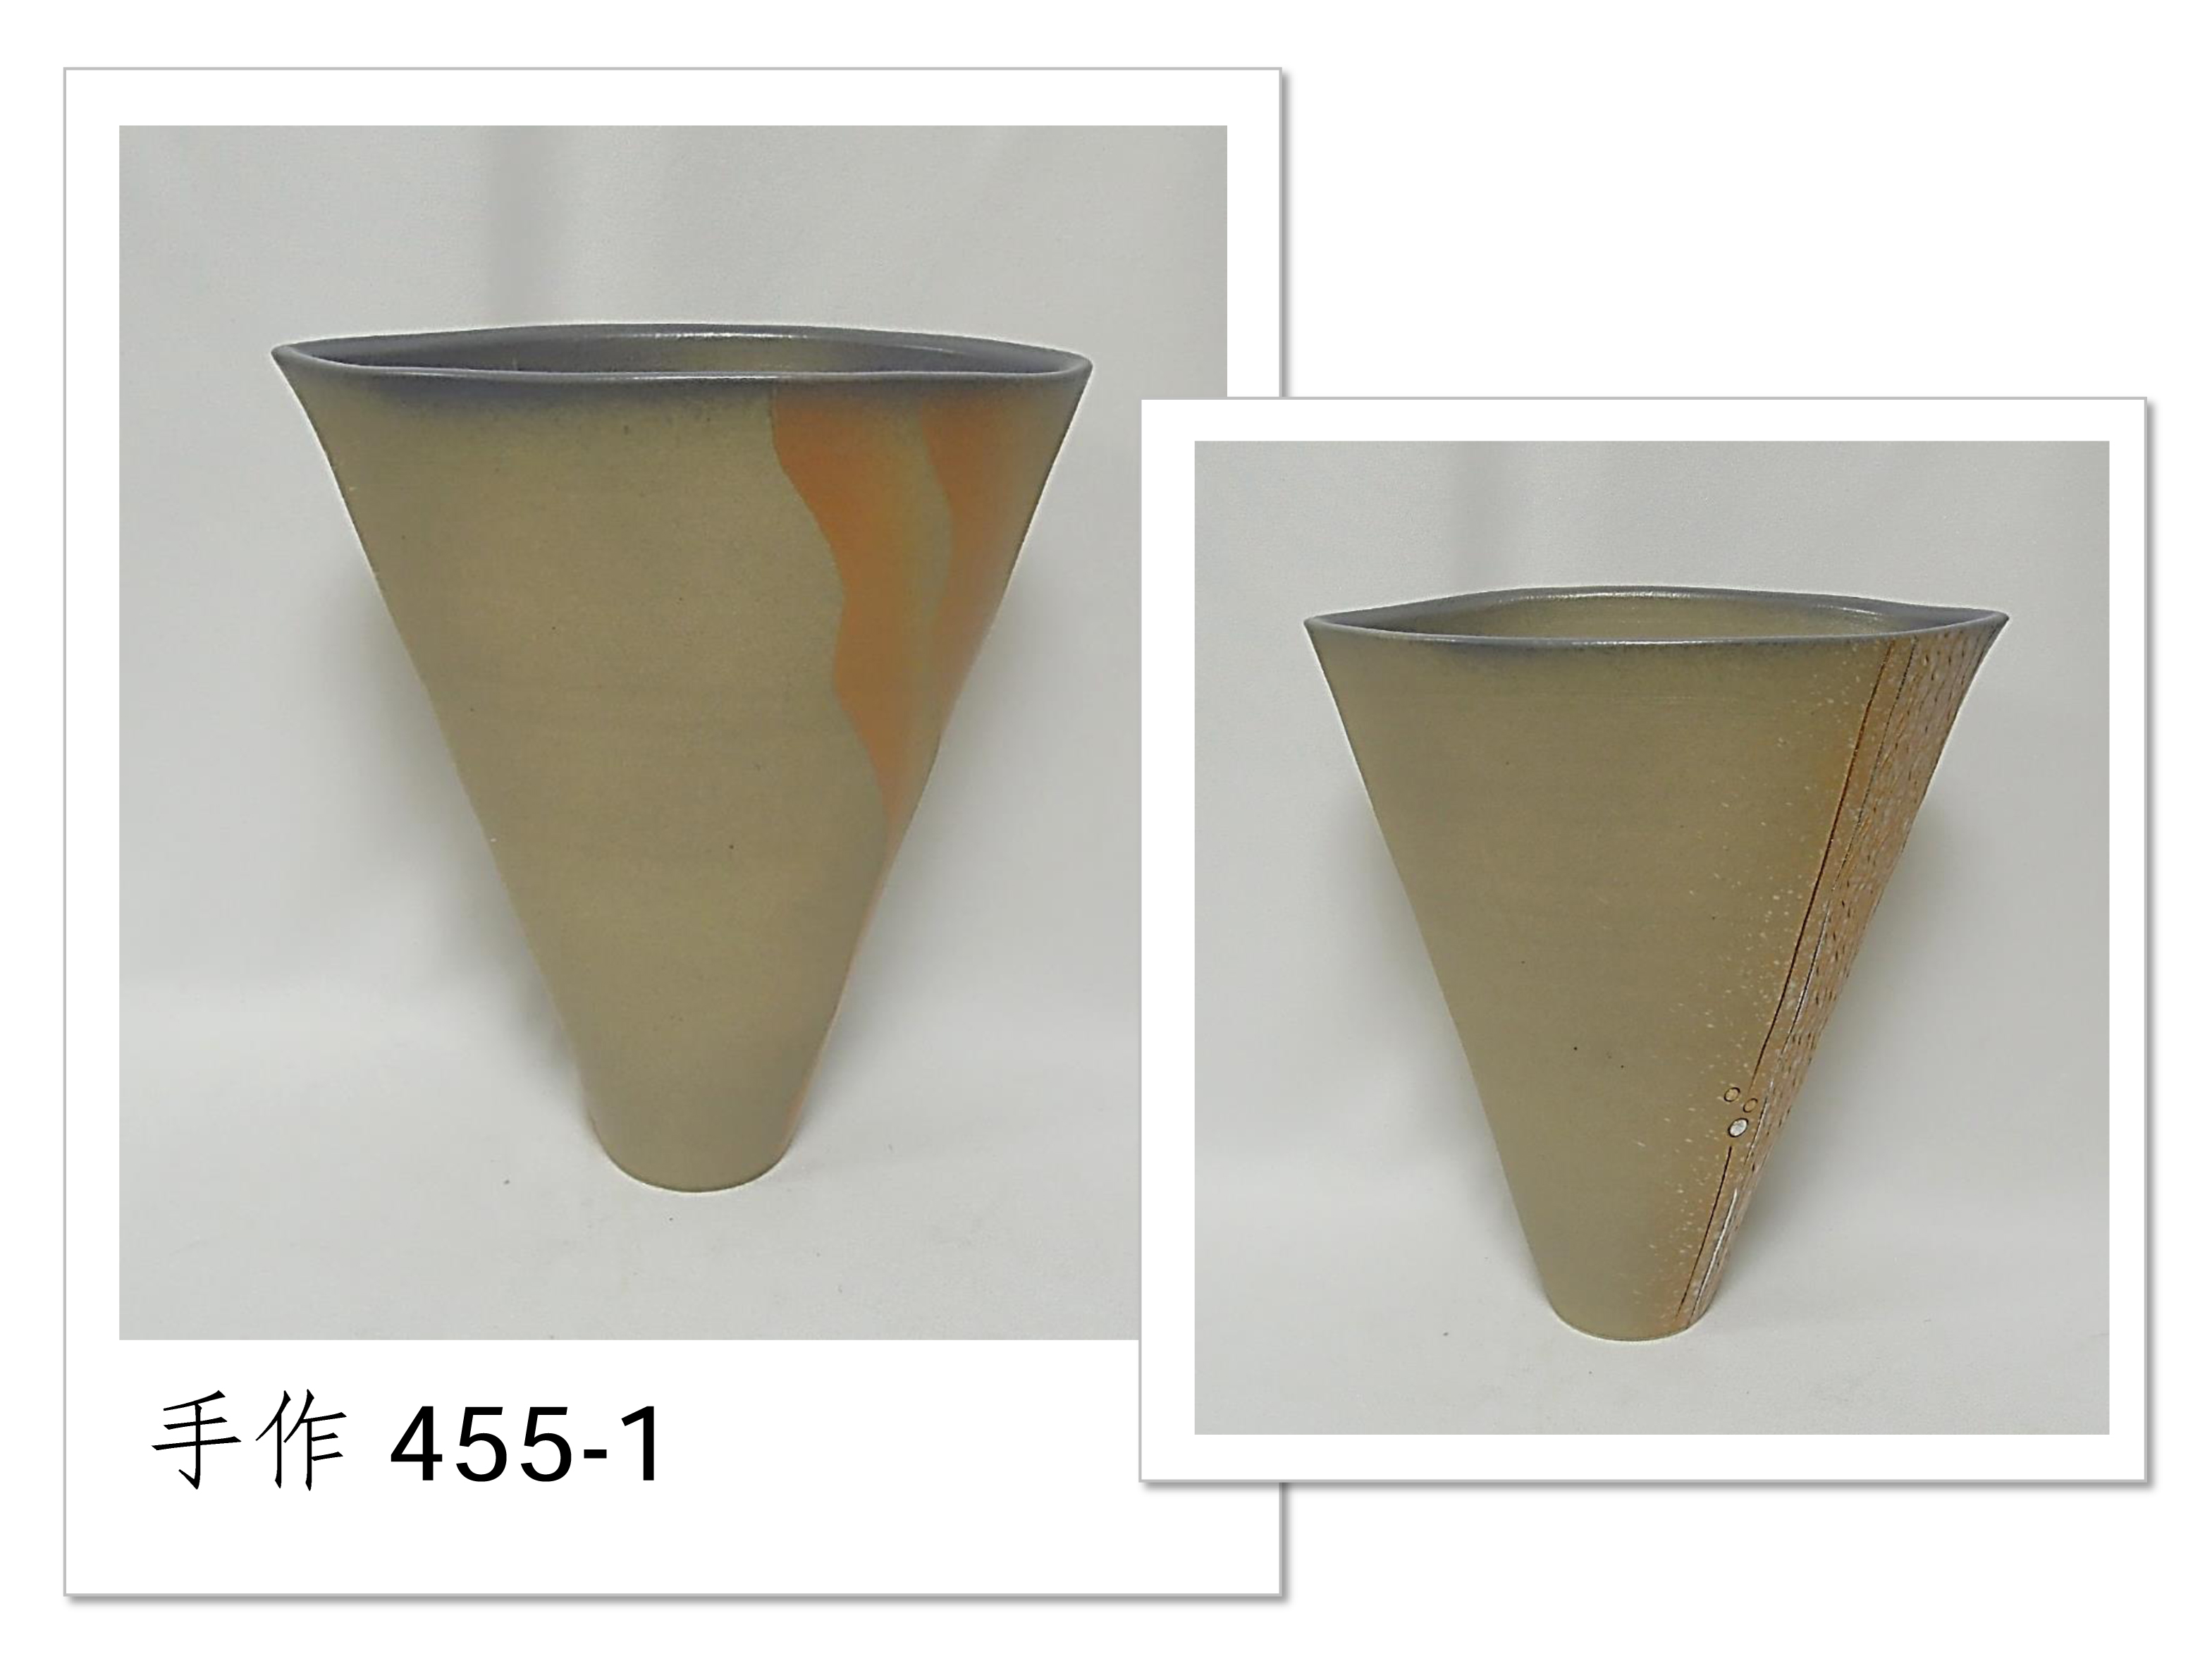 455-1